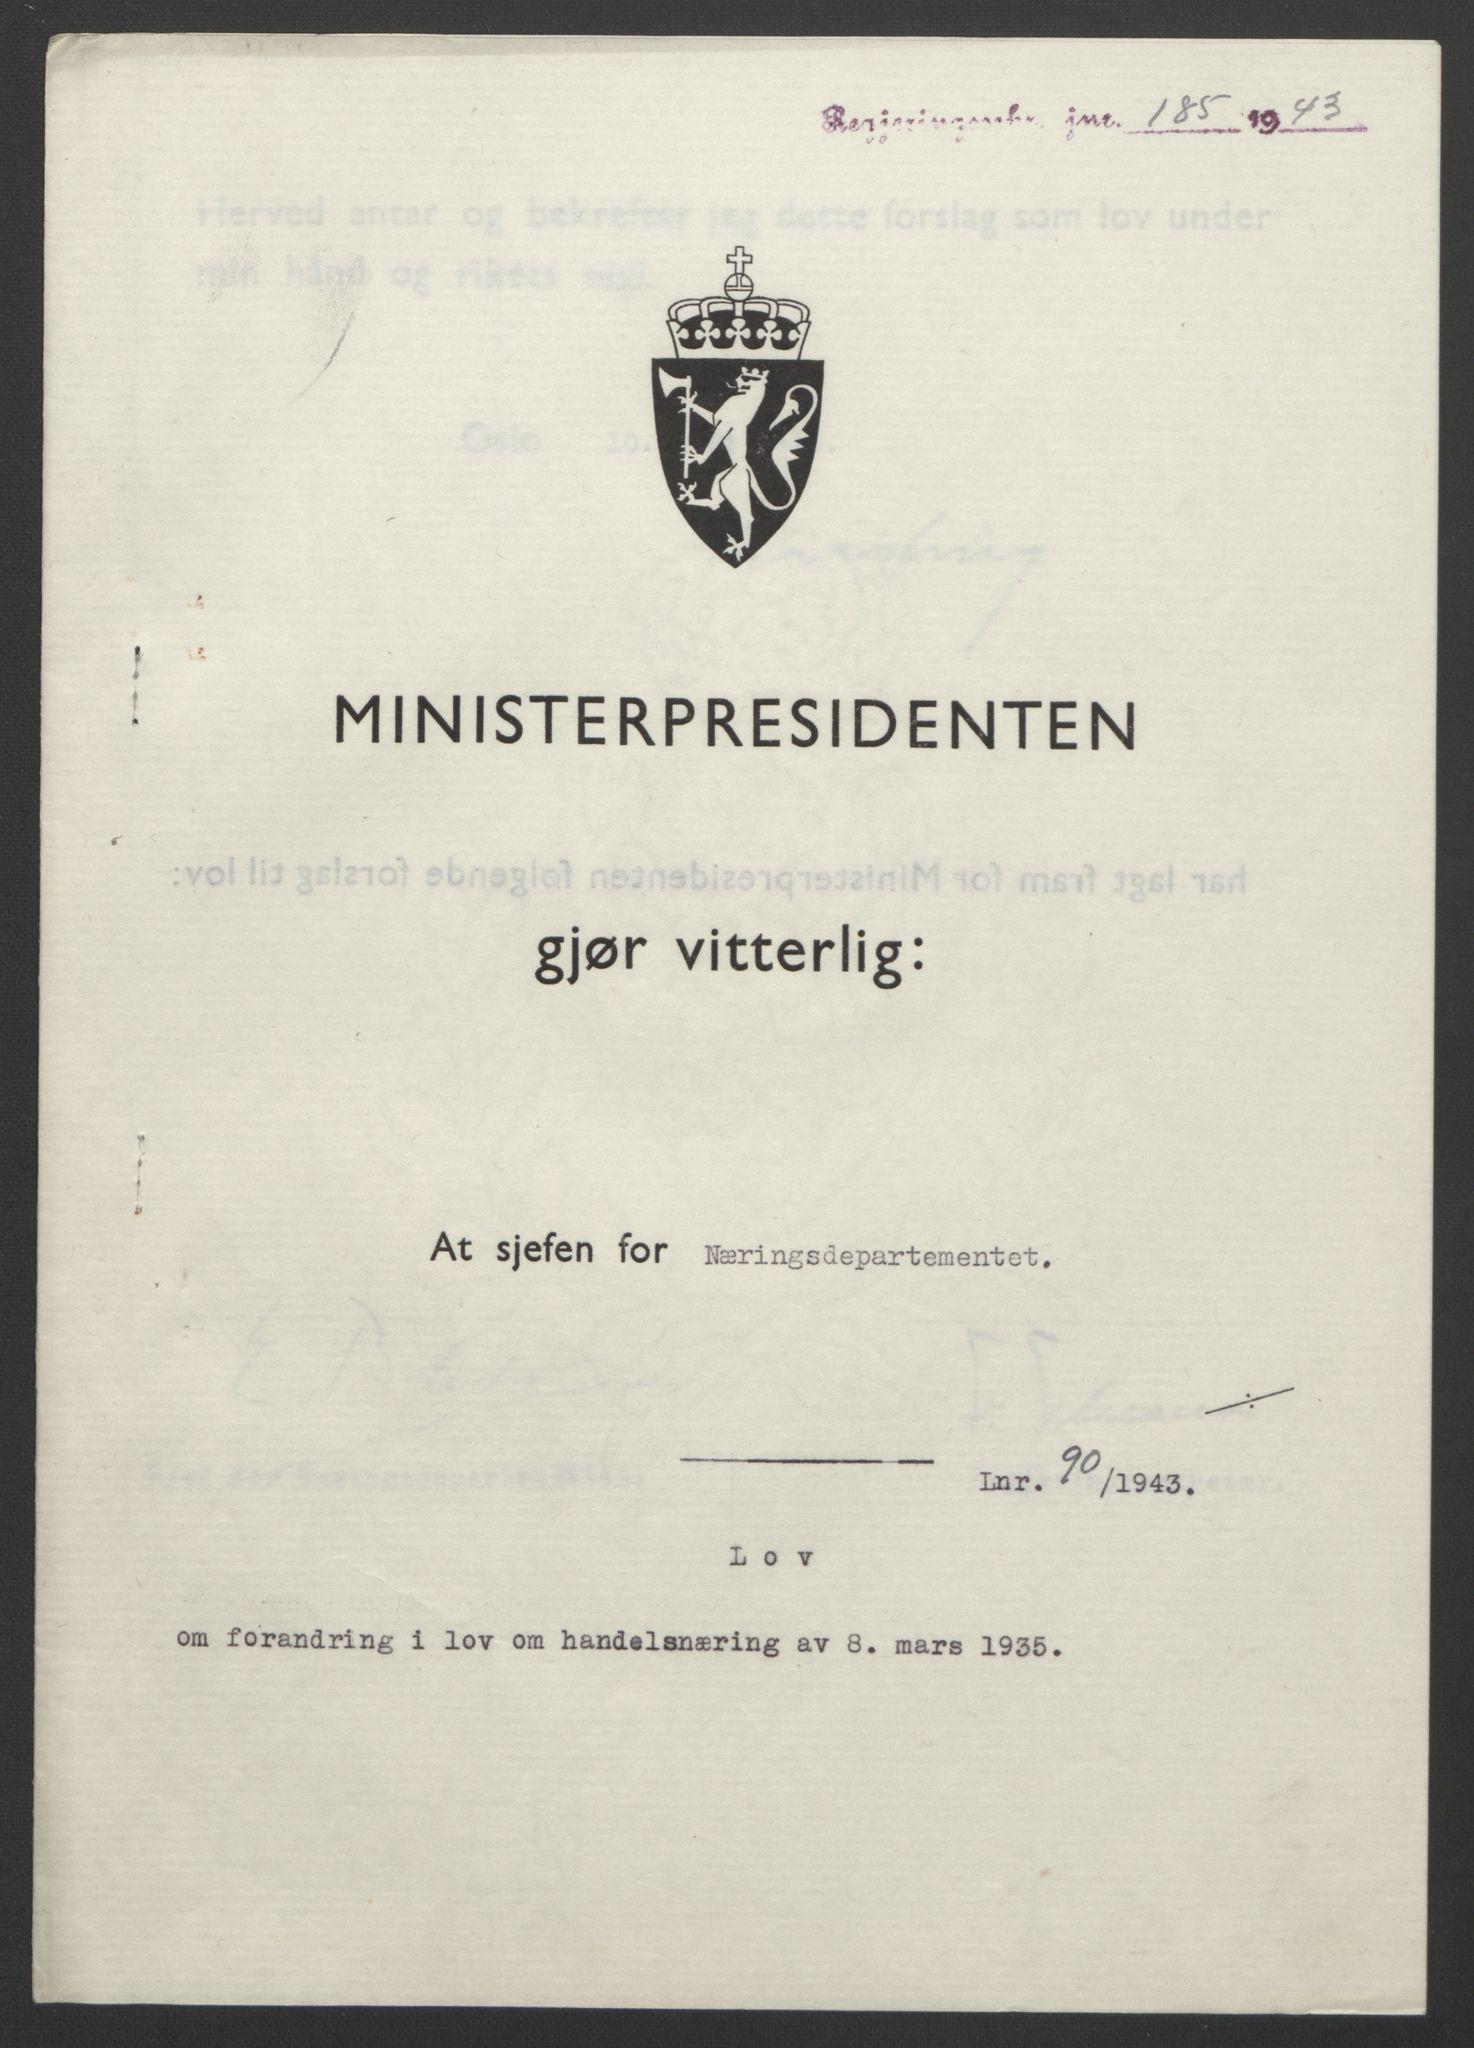 RA, NS-administrasjonen 1940-1945 (Statsrådsekretariatet, de kommisariske statsråder mm), D/Db/L0099: Lover, 1943, s. 408